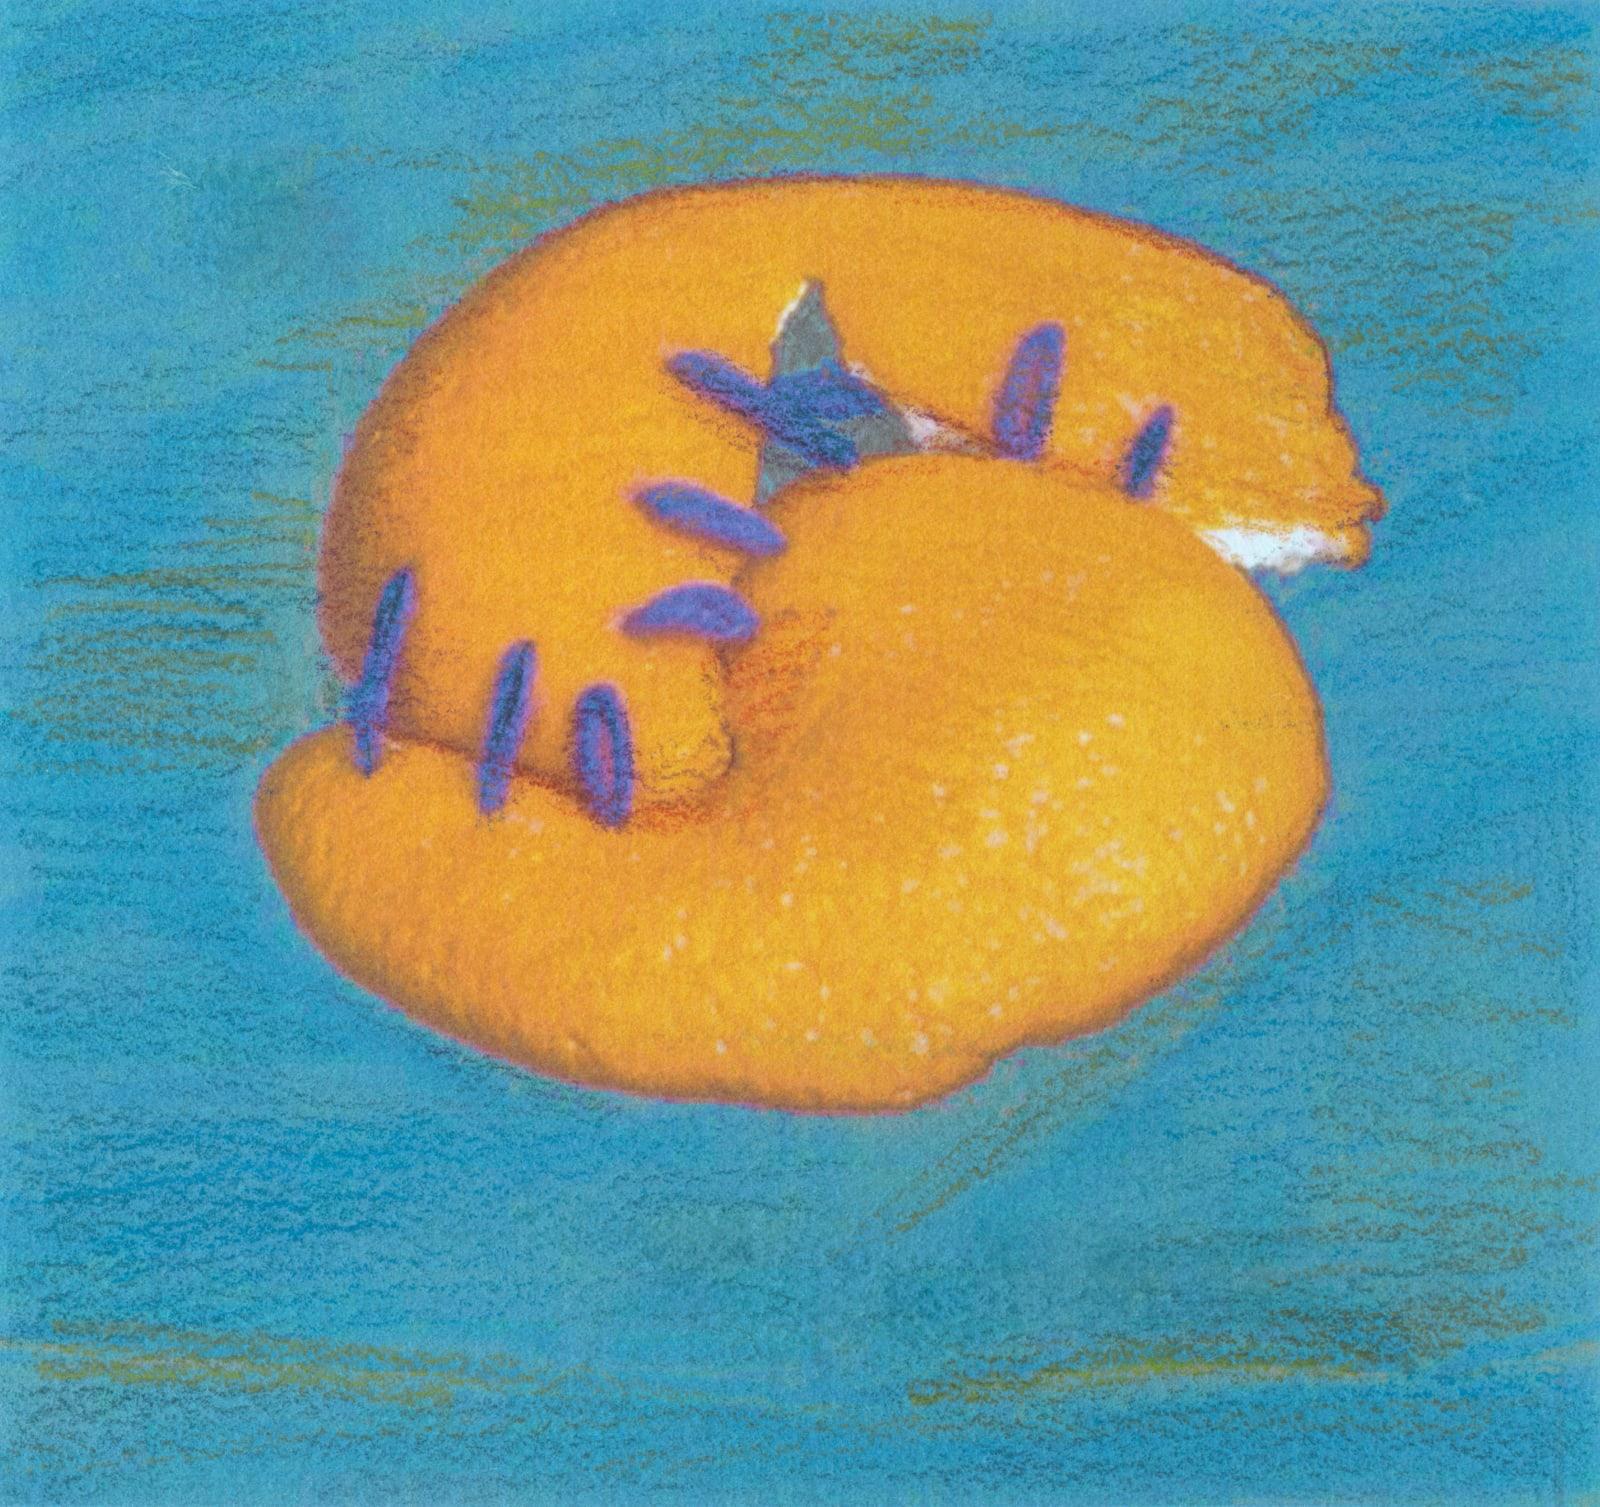 Pamela Davis Kivelson, #56 Orange Negitive Curvature 2, 2020